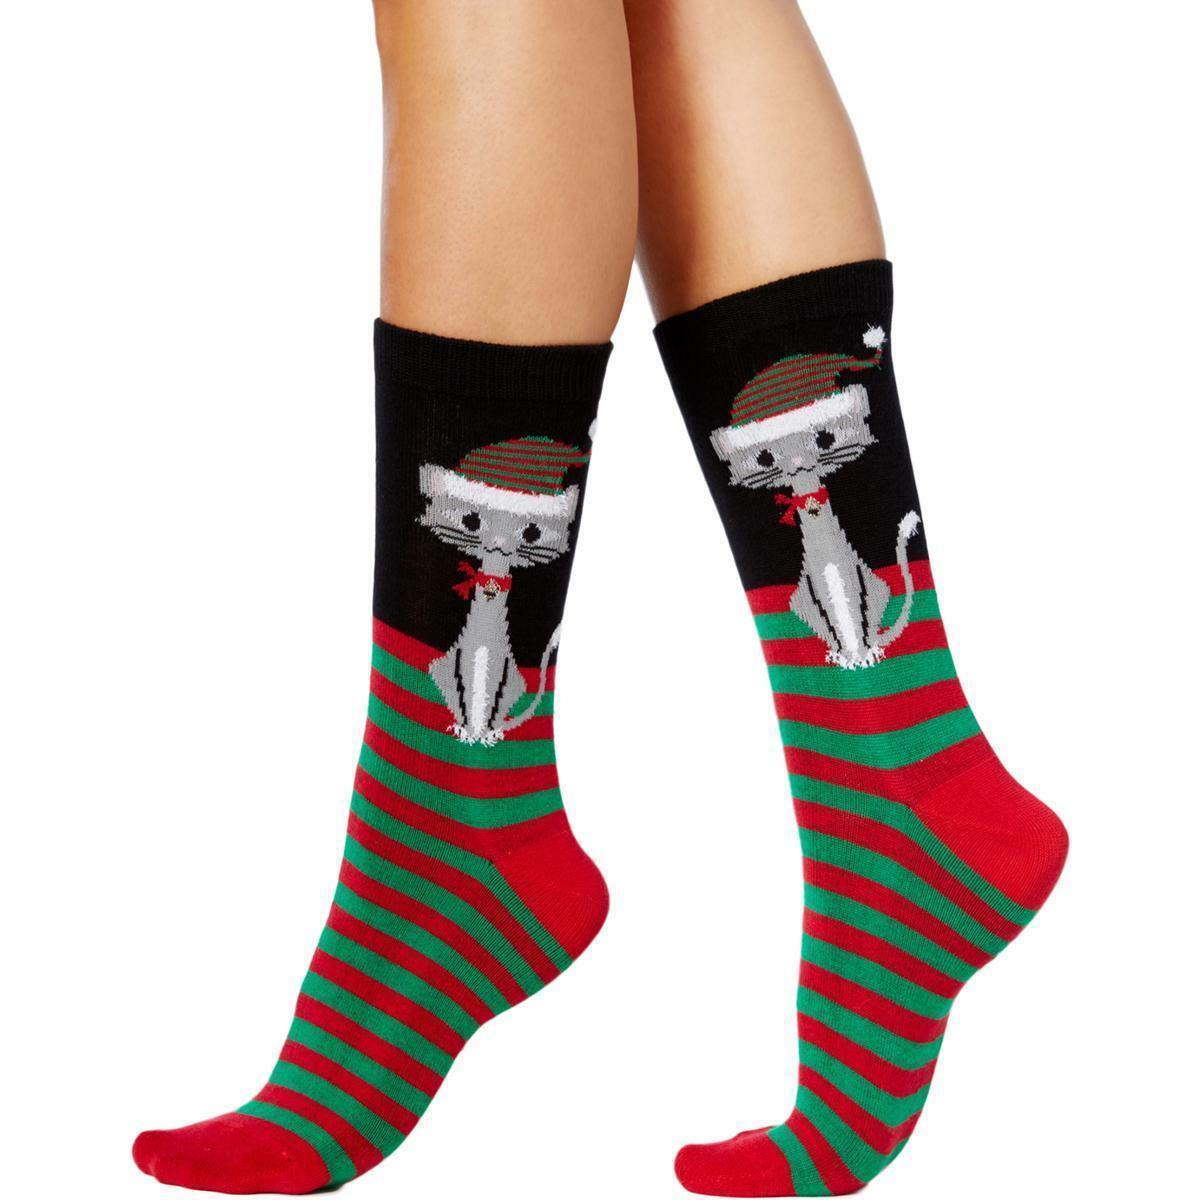 Charter Club women's Holiday Crew Socks Mega Kitty Stripes